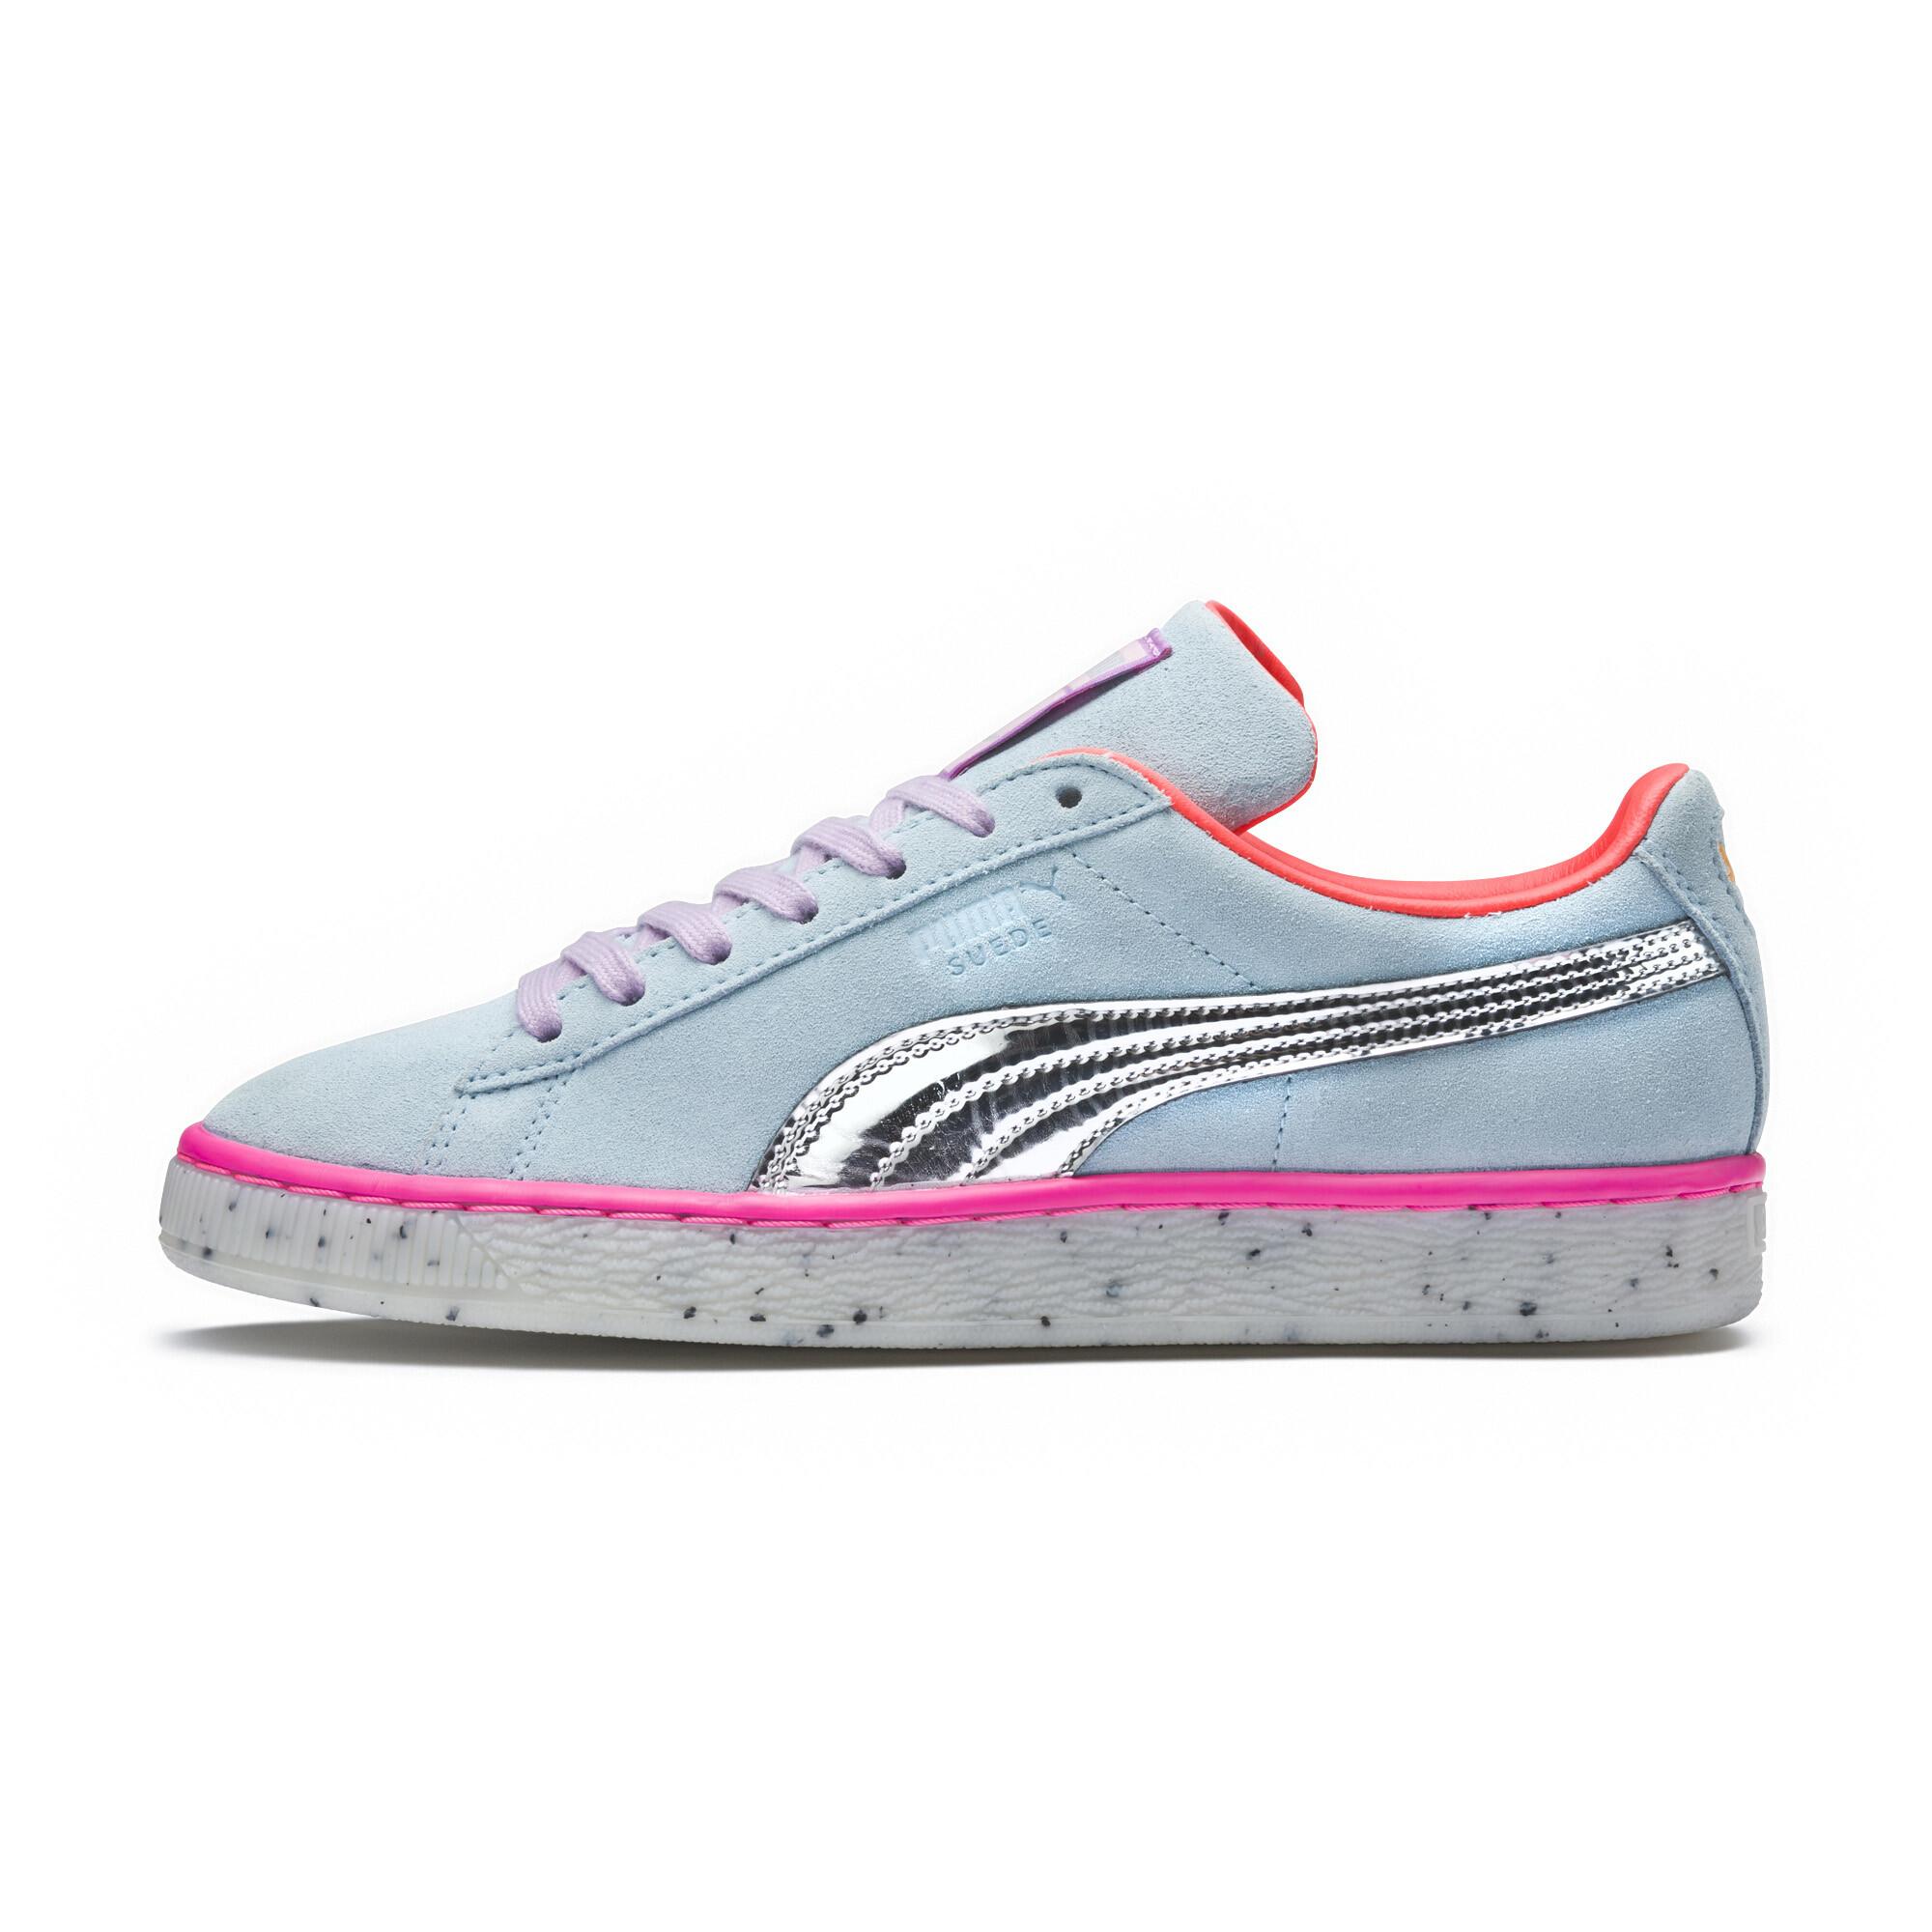 Image Puma PUMA x SOPHIA WEBSTER Women's Suede Candy Princess Sneakers #1